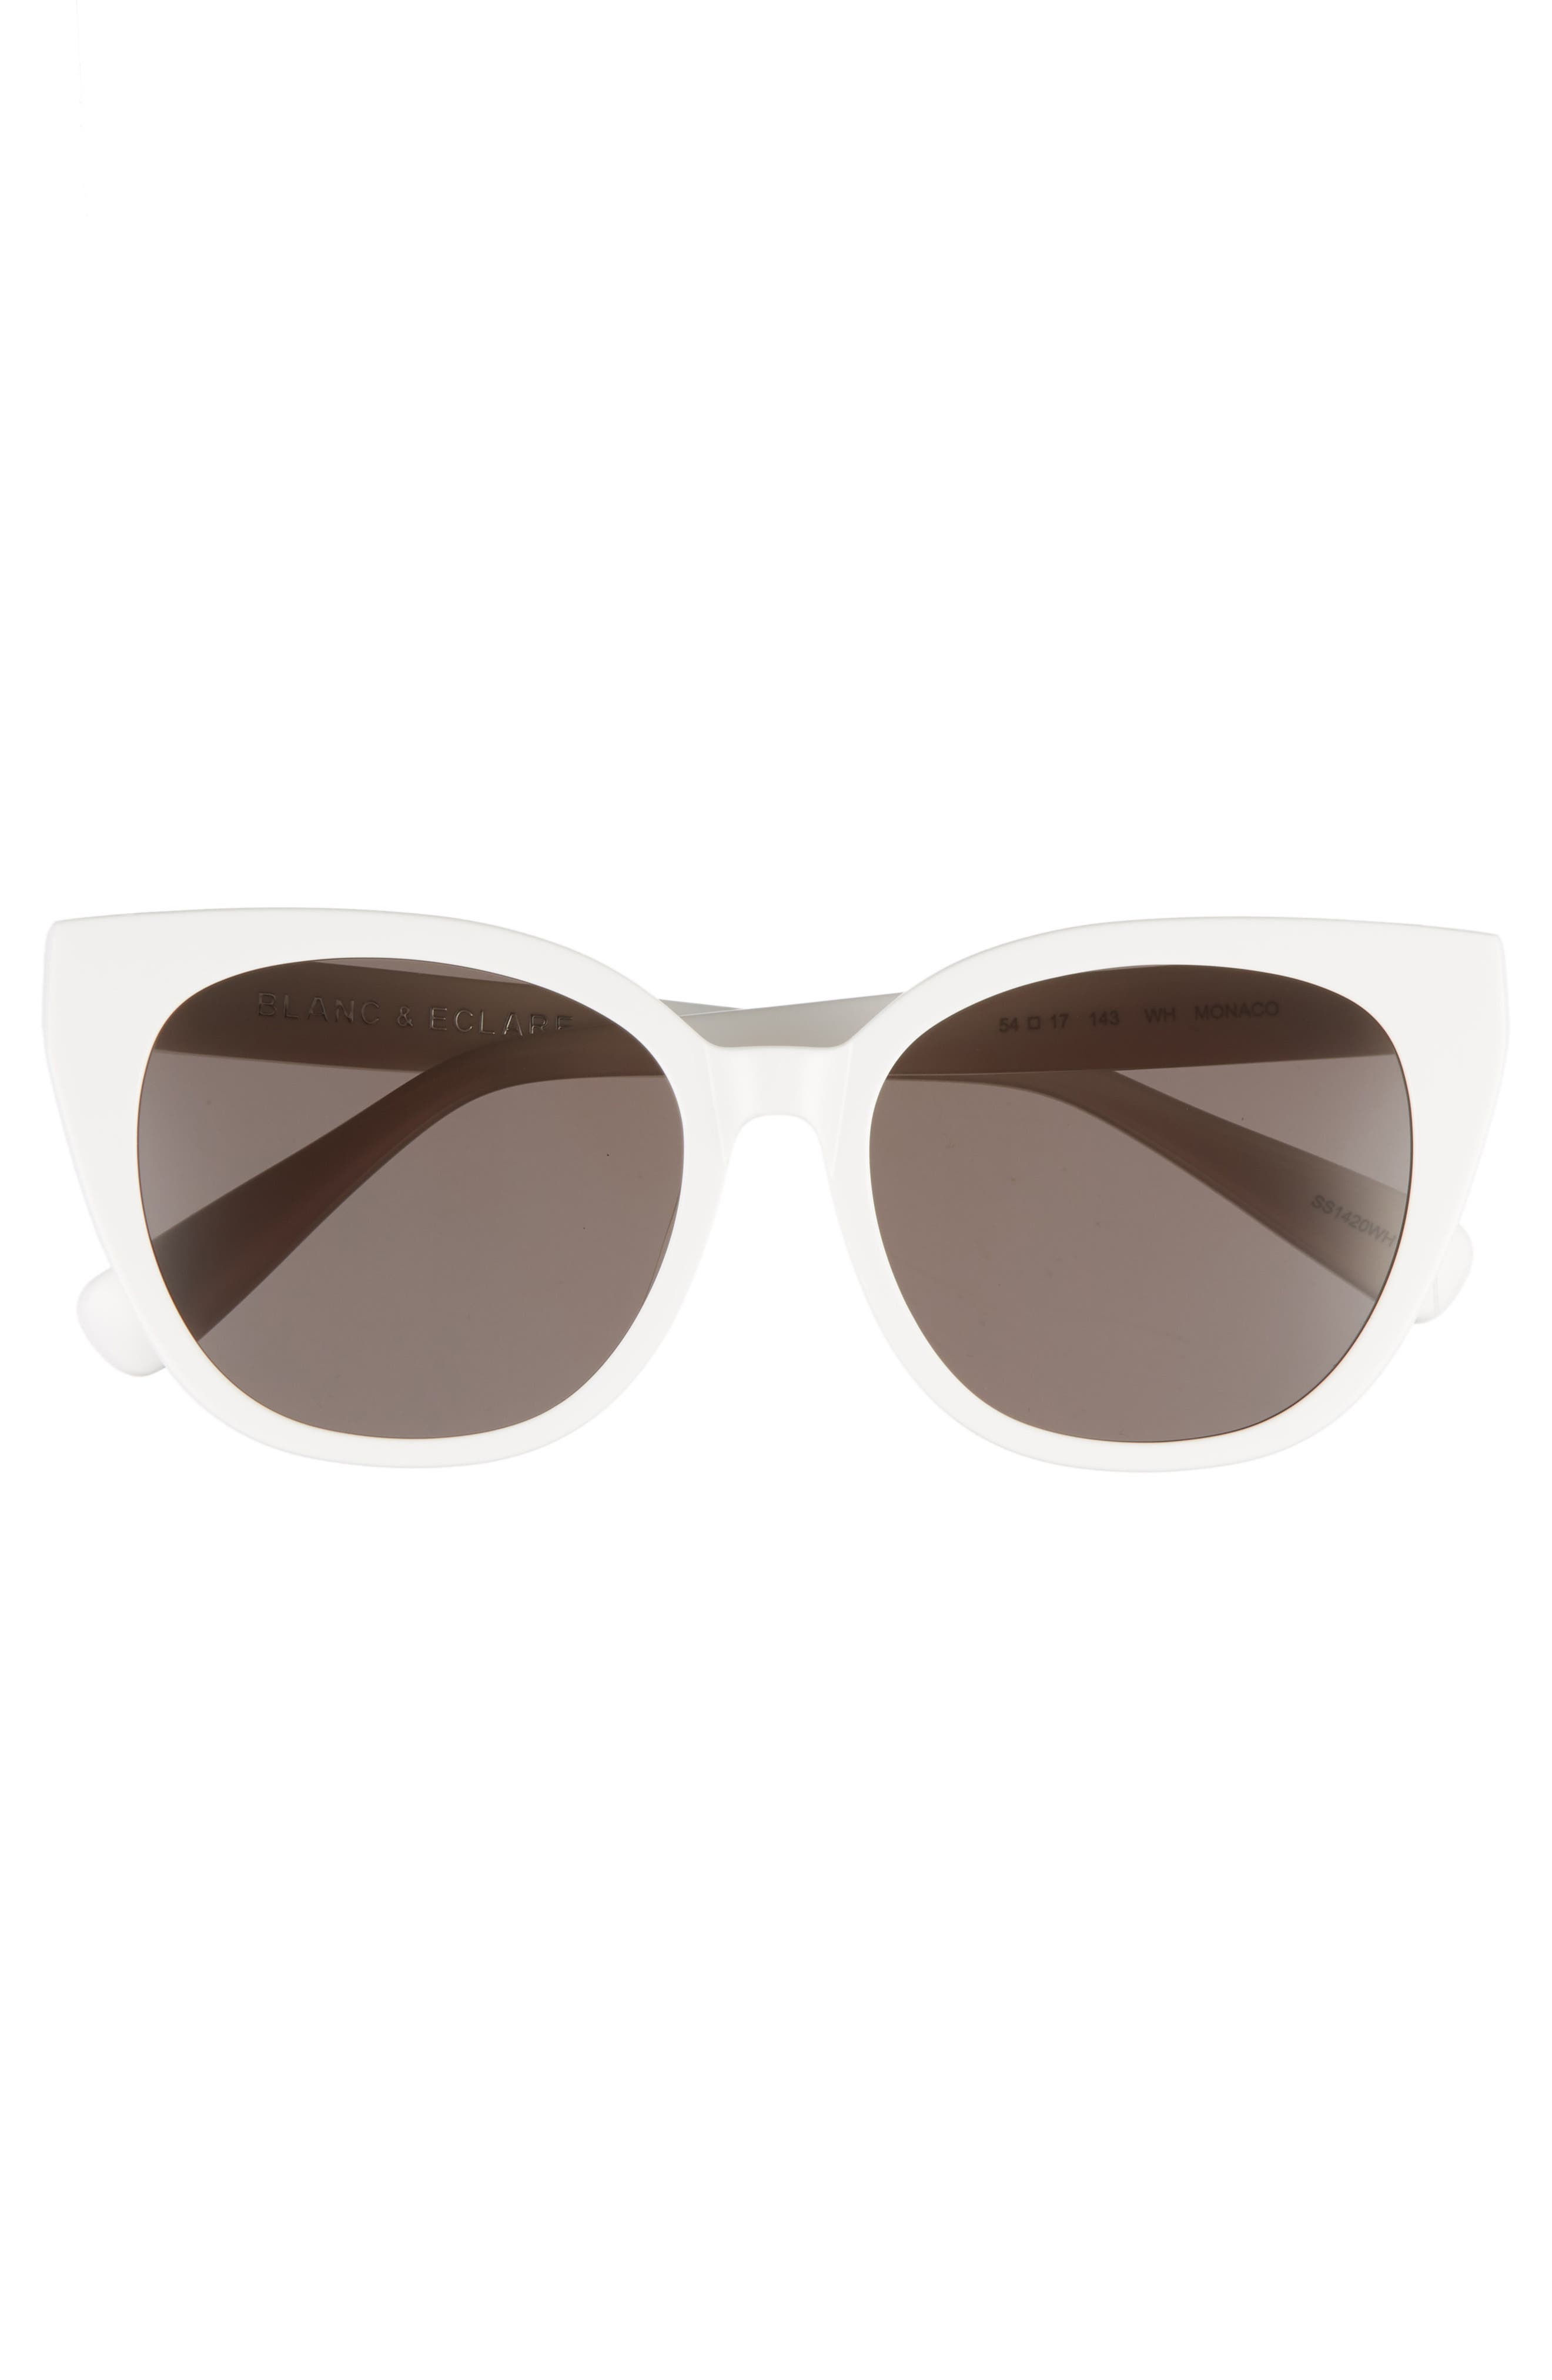 BLANC & ECLARE Monaco 54mm Cat Eye Sunglasses,                             Alternate thumbnail 3, color,                             SNOW/ SMOG GREY